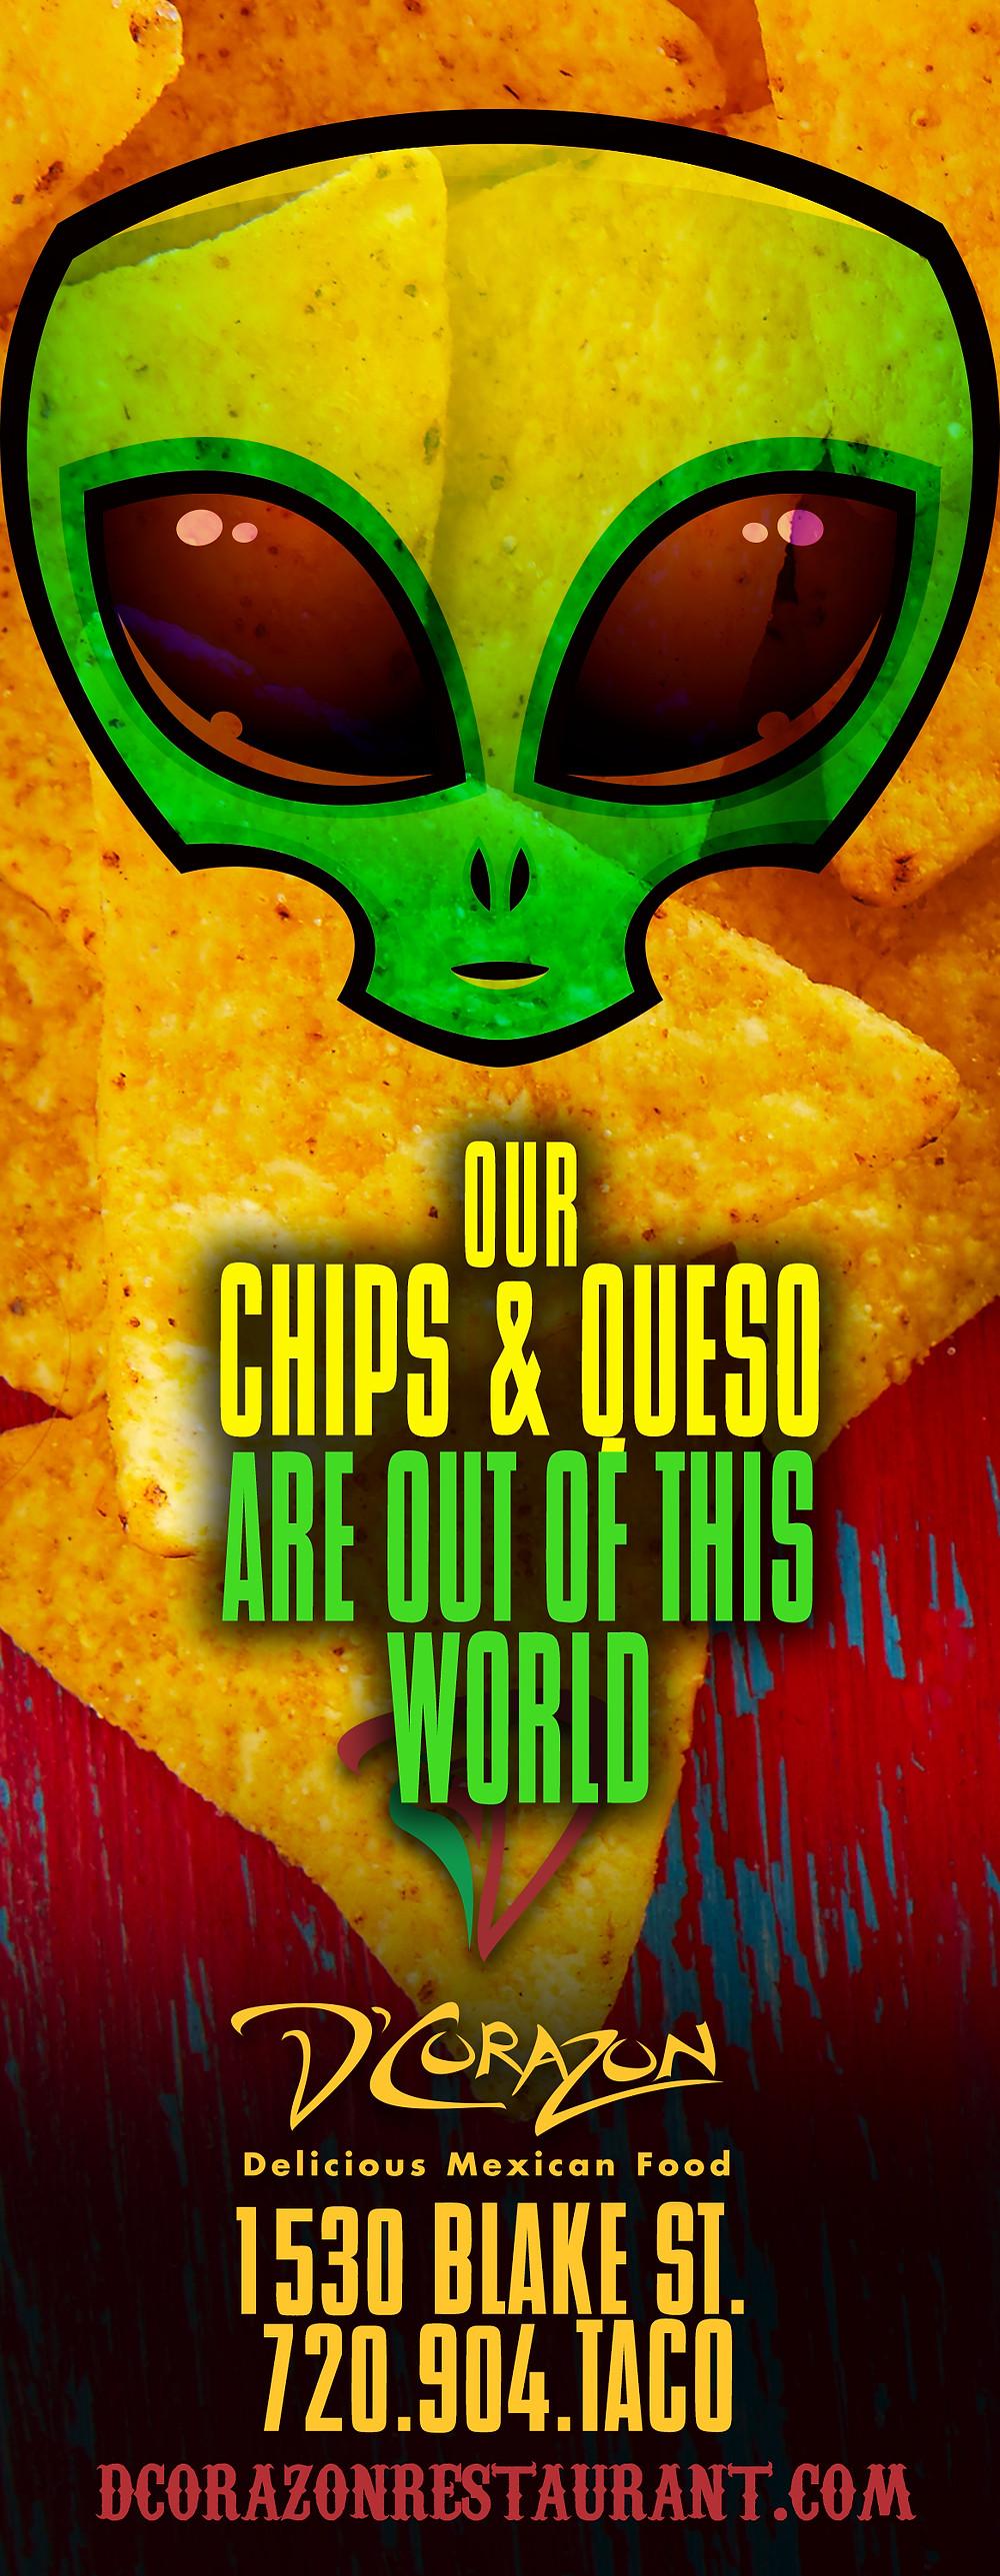 Mexican Restaurant Ad Design - Graphic Designer in Denver